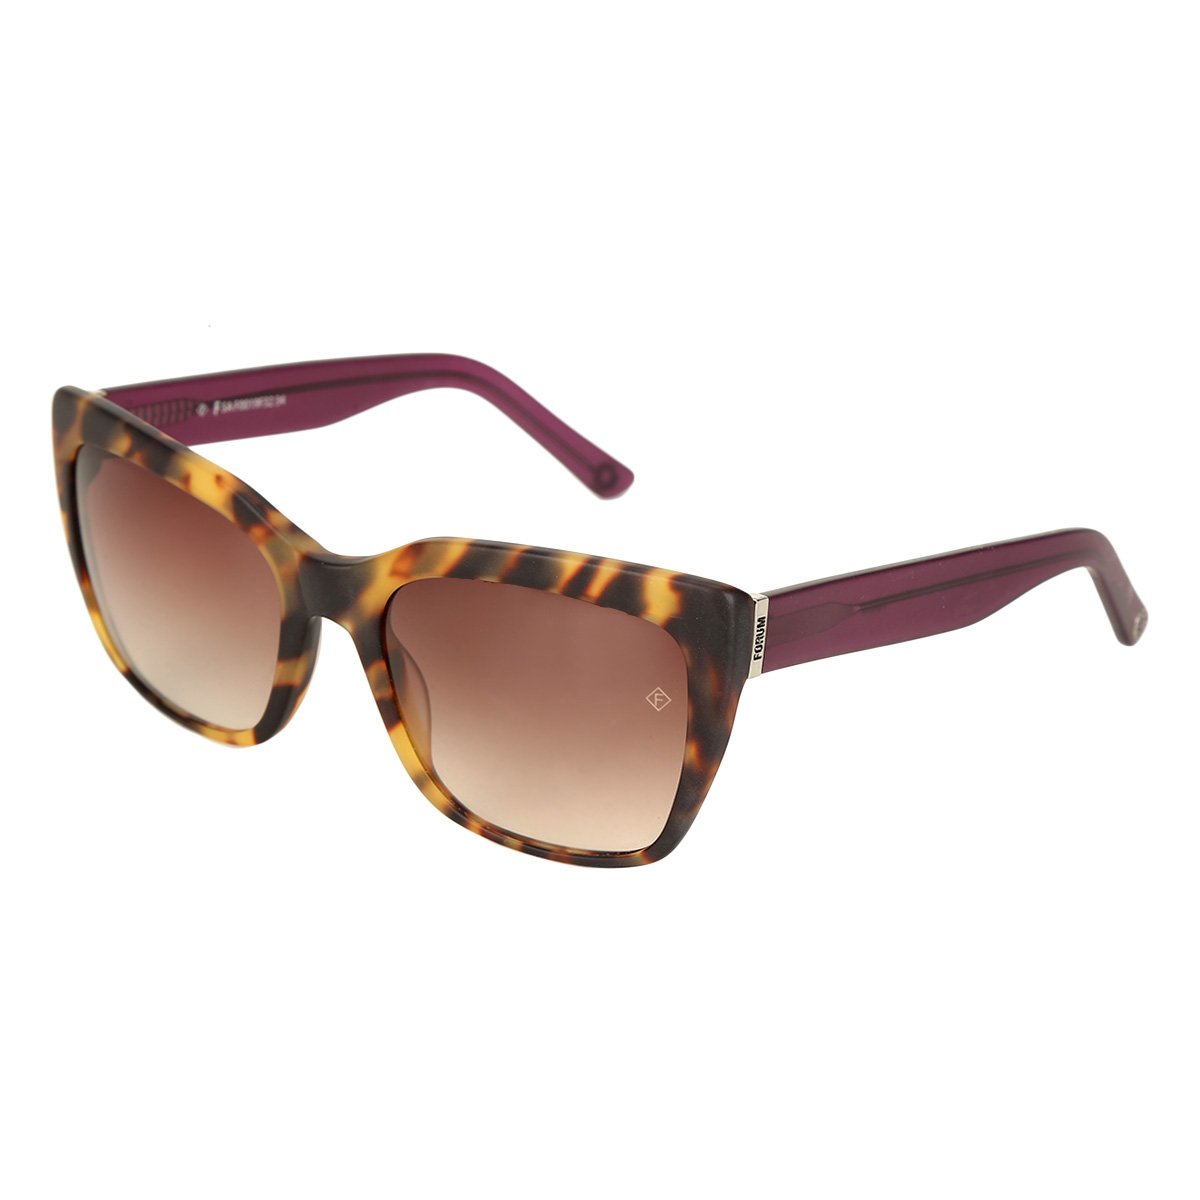 41b2f931d Óculos de Sol Forum Tartaruga Feminino - Marrom   Menor preço com cupom